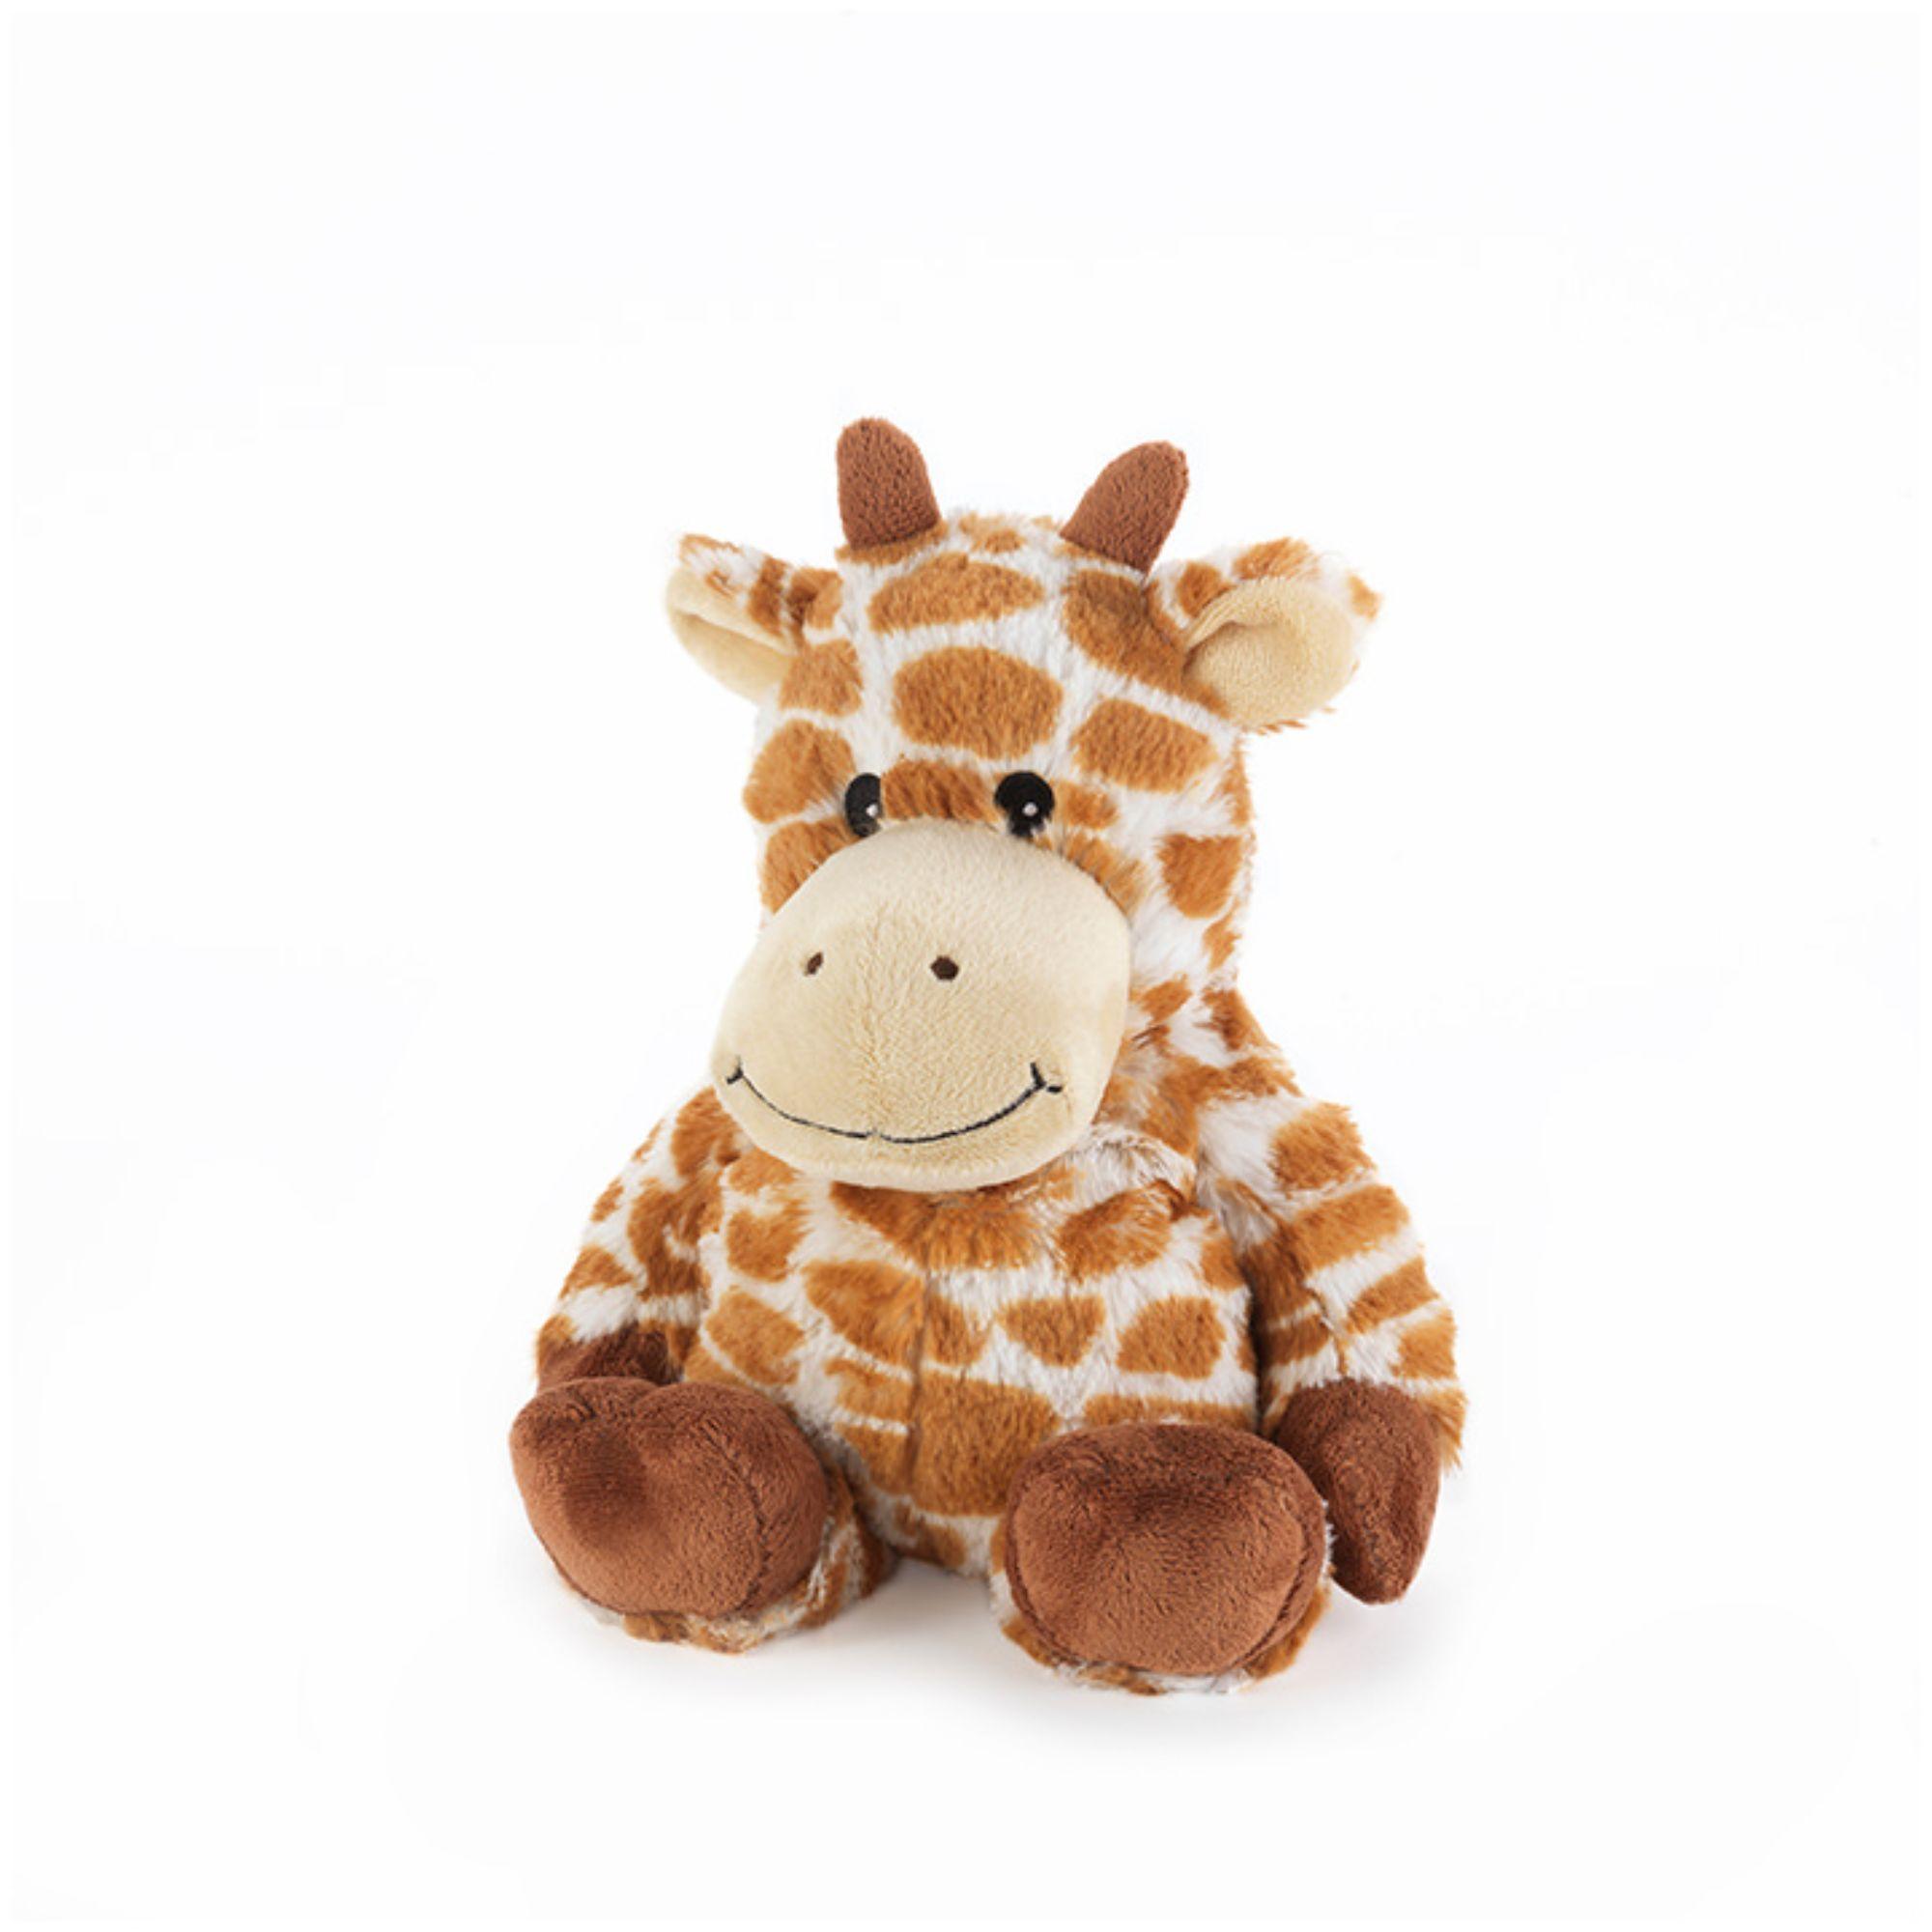 "13"" Brown and White Microwavable Plush Giraffe Stuffed"